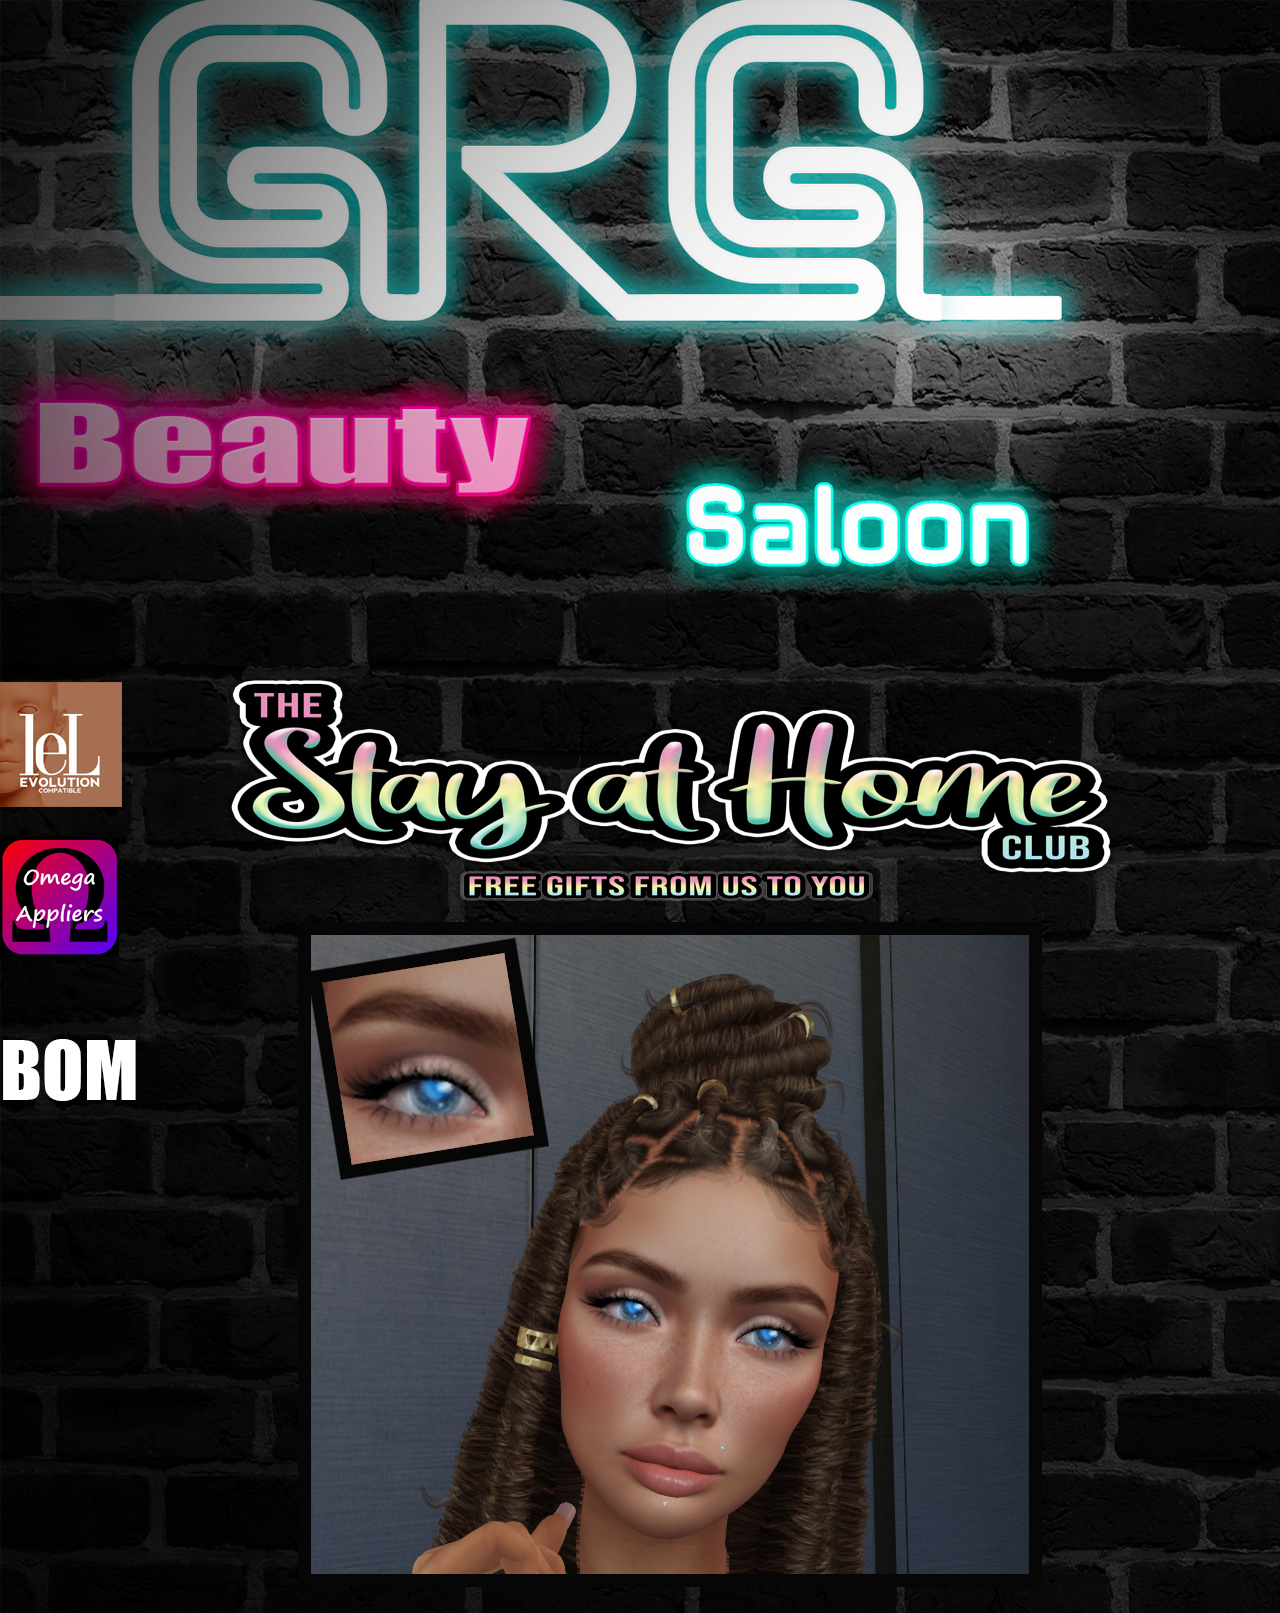 Grg Beauty Store - Eyes